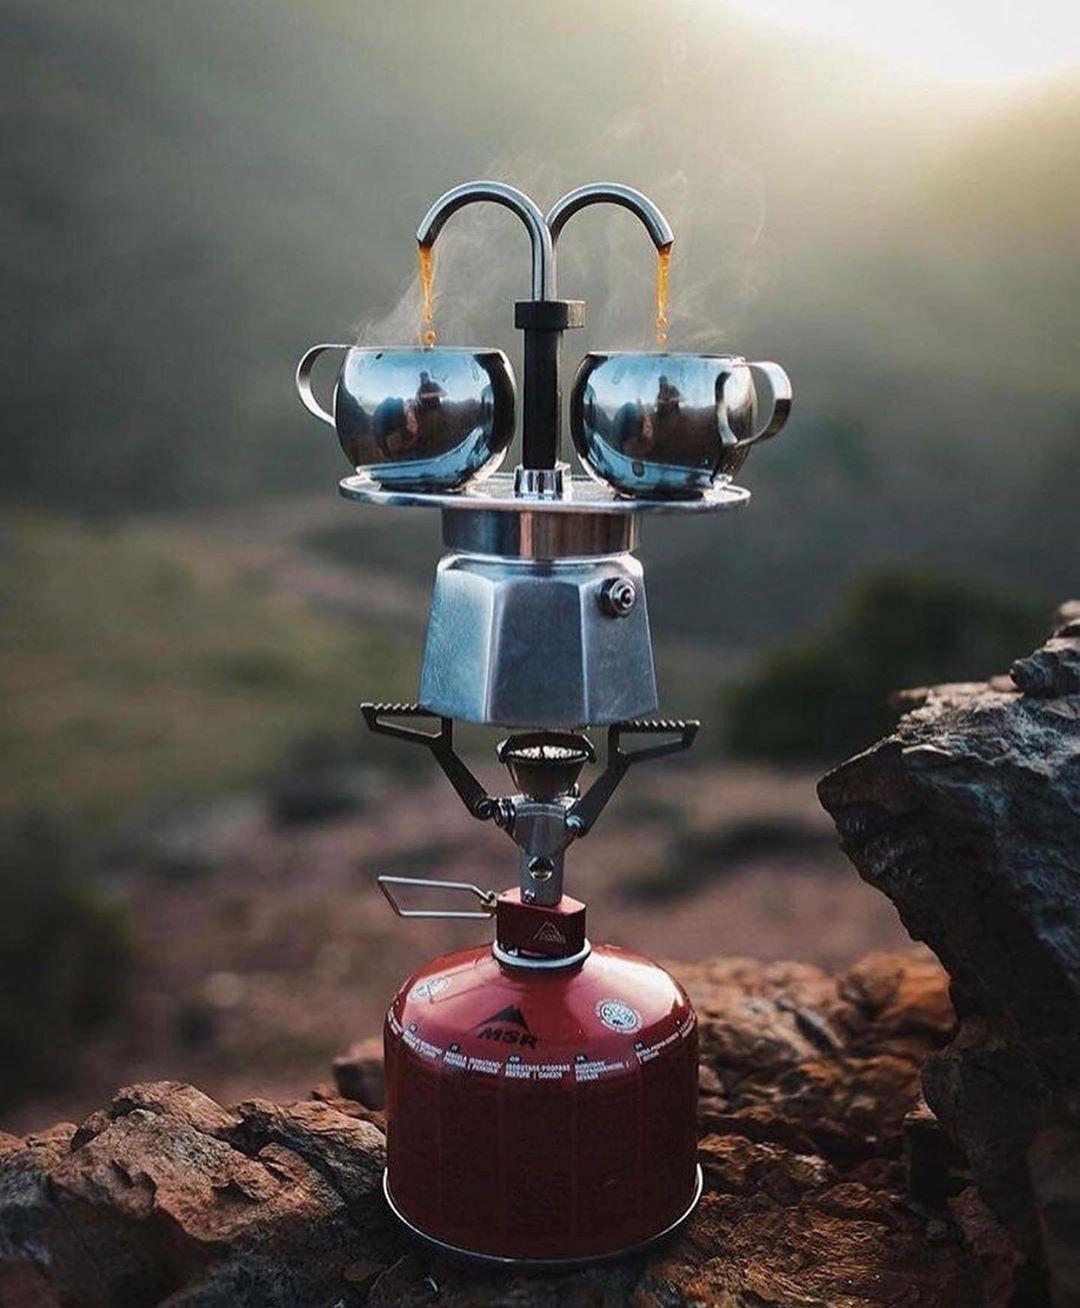 Bialetti Mini Expresso di 2020 Kopi, Alat pembuat kopi